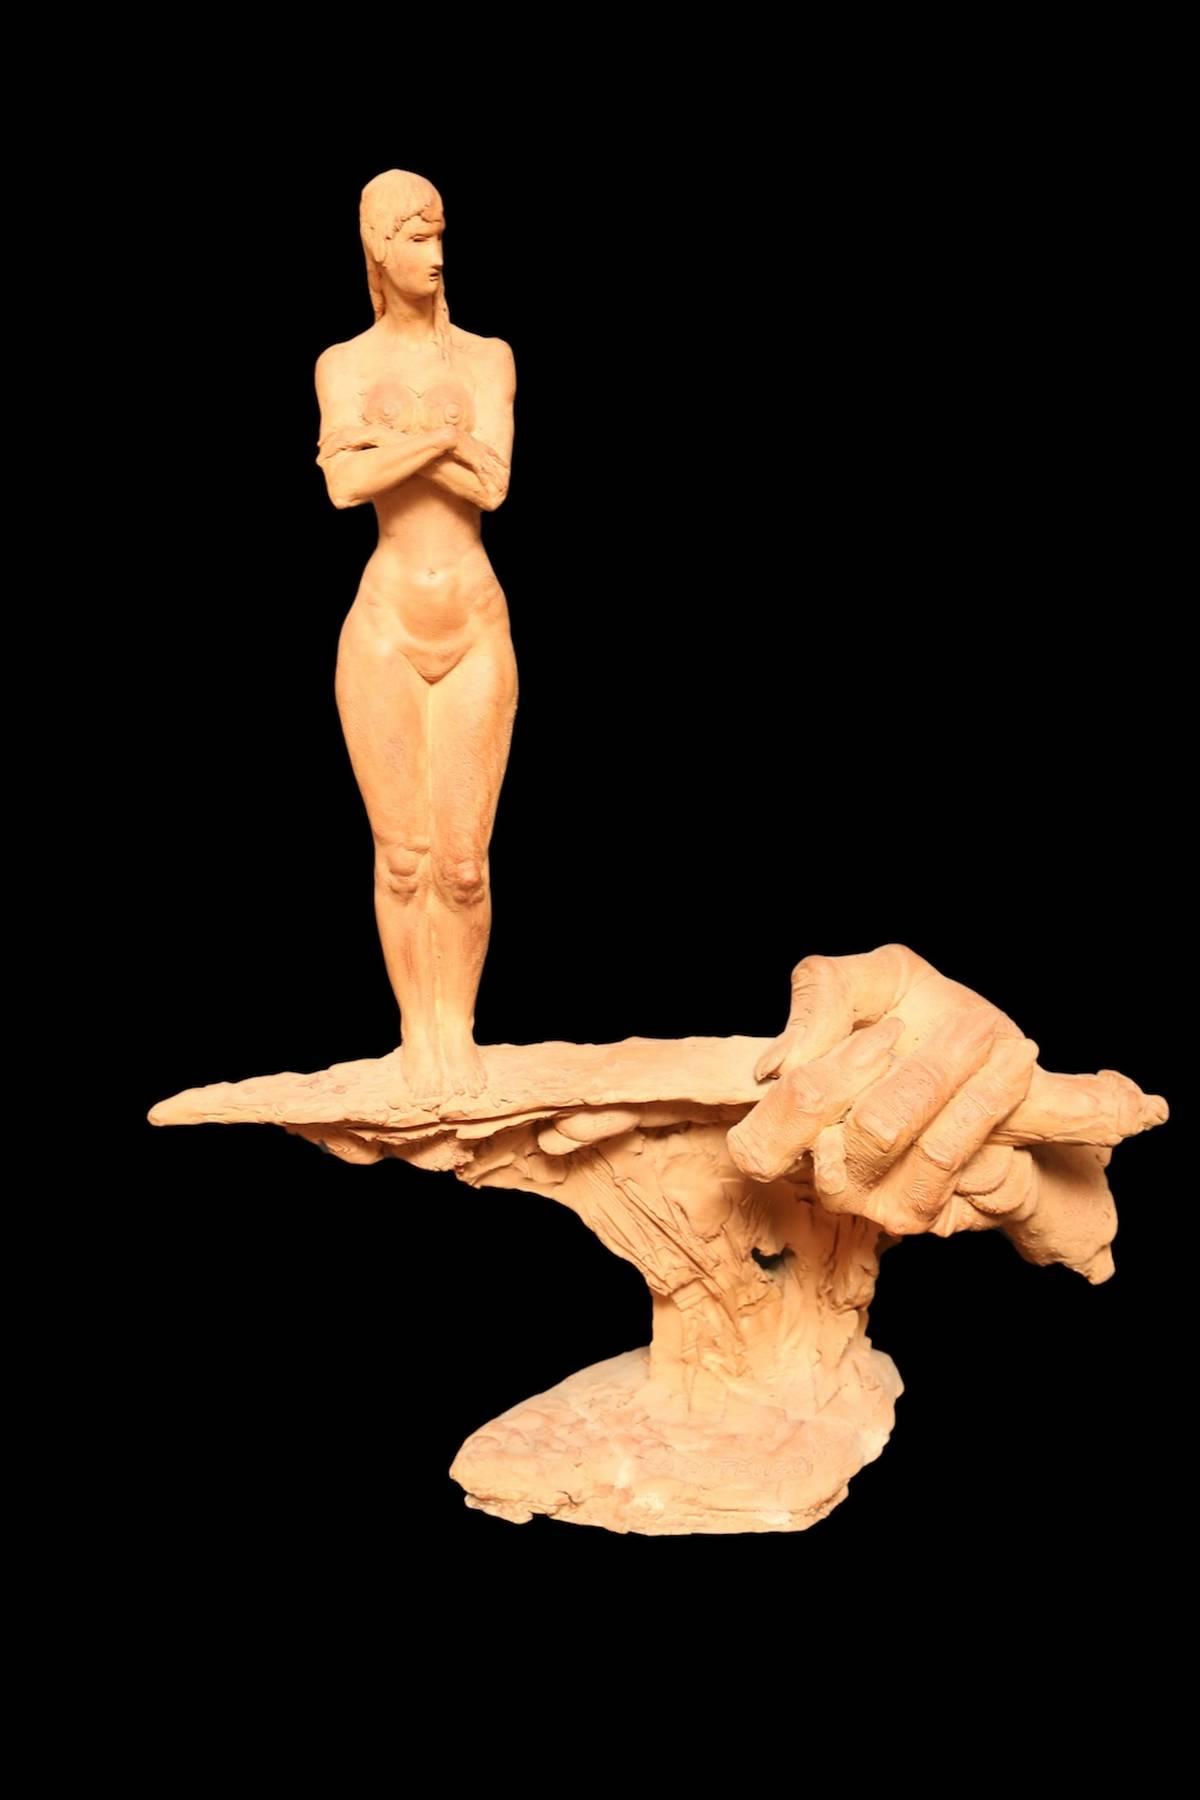 A.Falchi,'La Potenza', terracotta, 1983, cm 43x15x54h